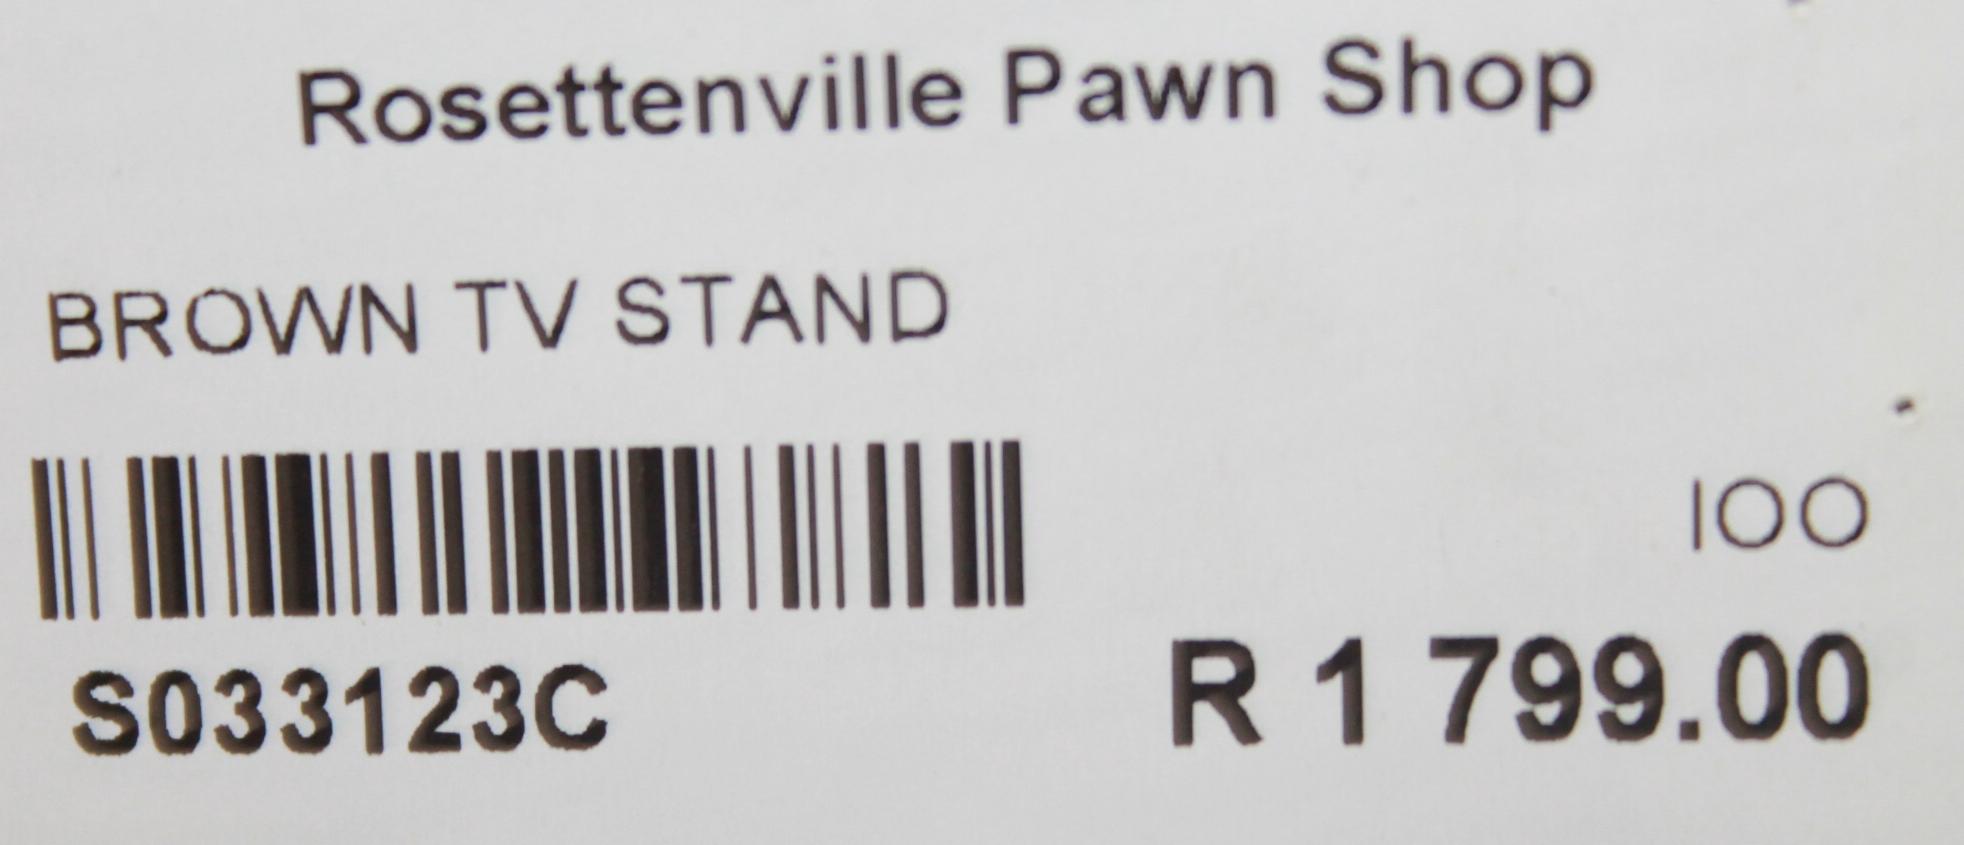 Tv stand S033123c Rosettenvillepawnshop